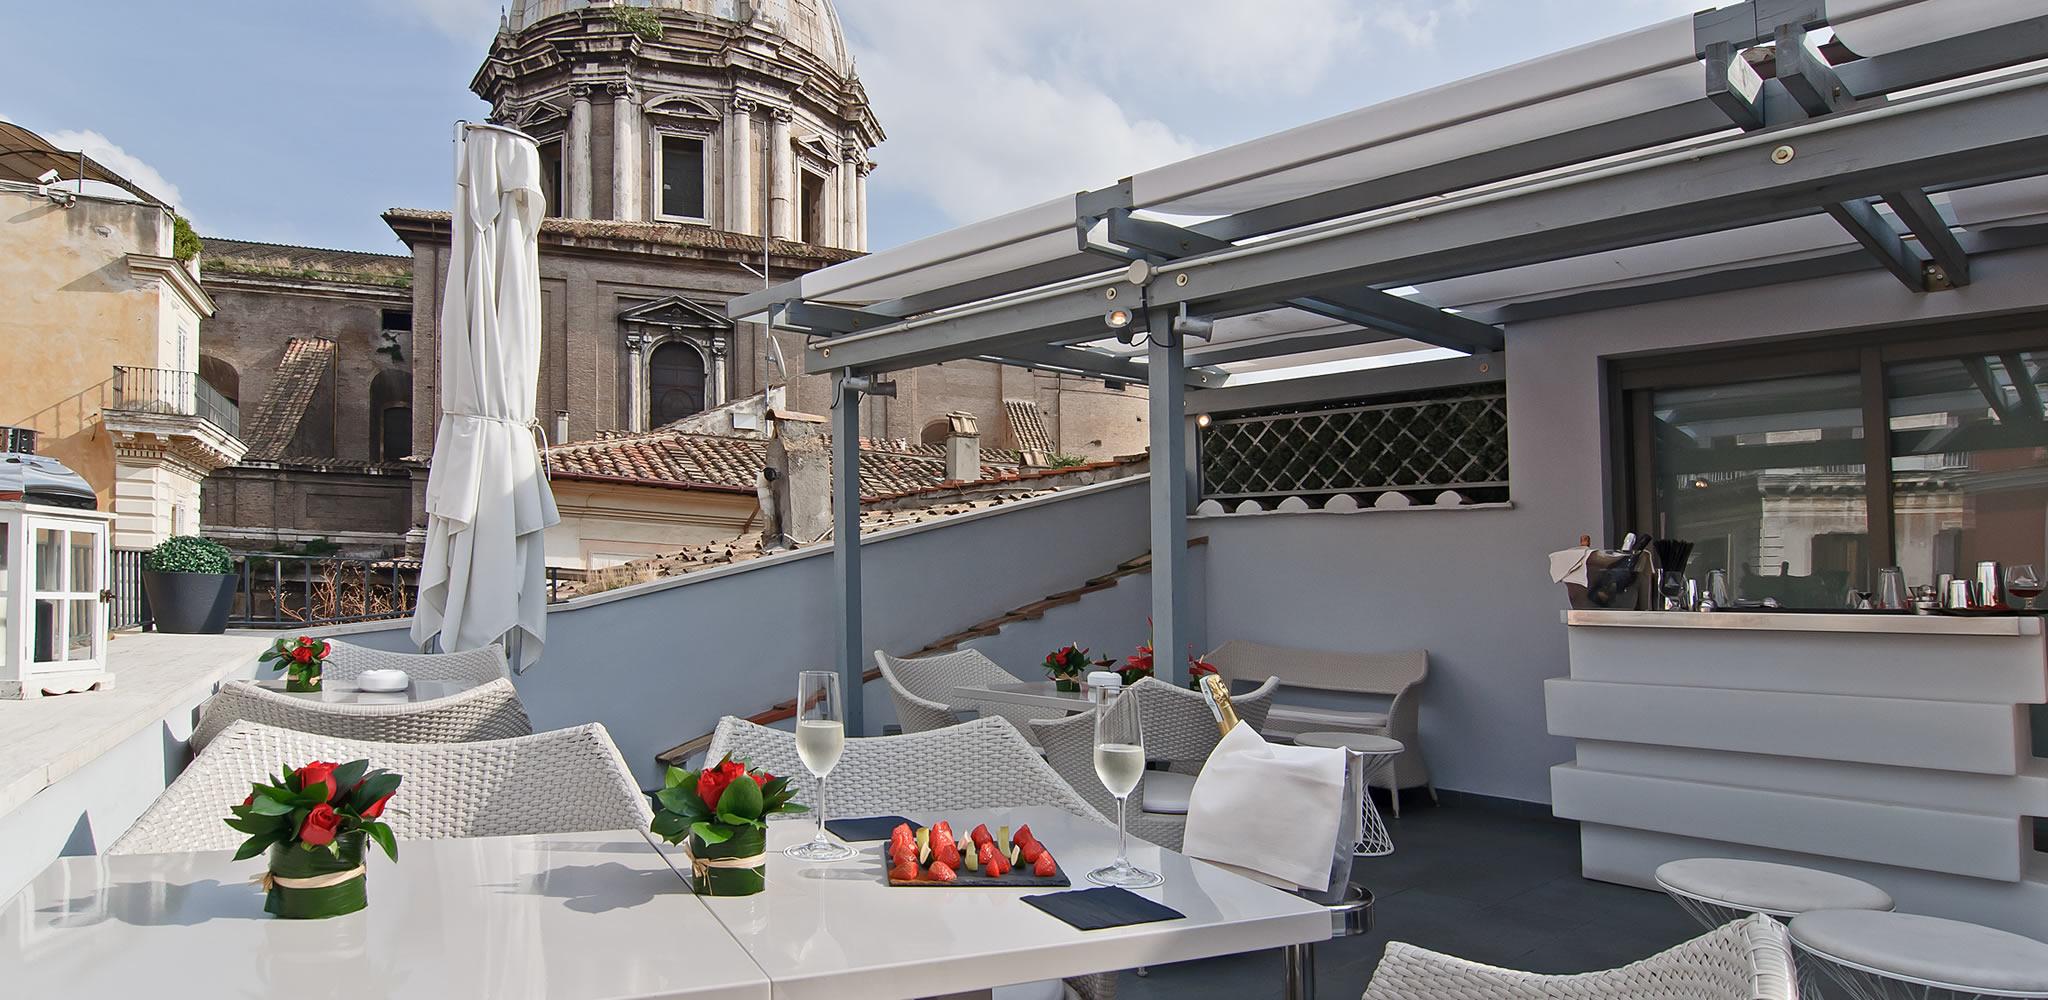 Hotel Lunetta Rome Roof Bar